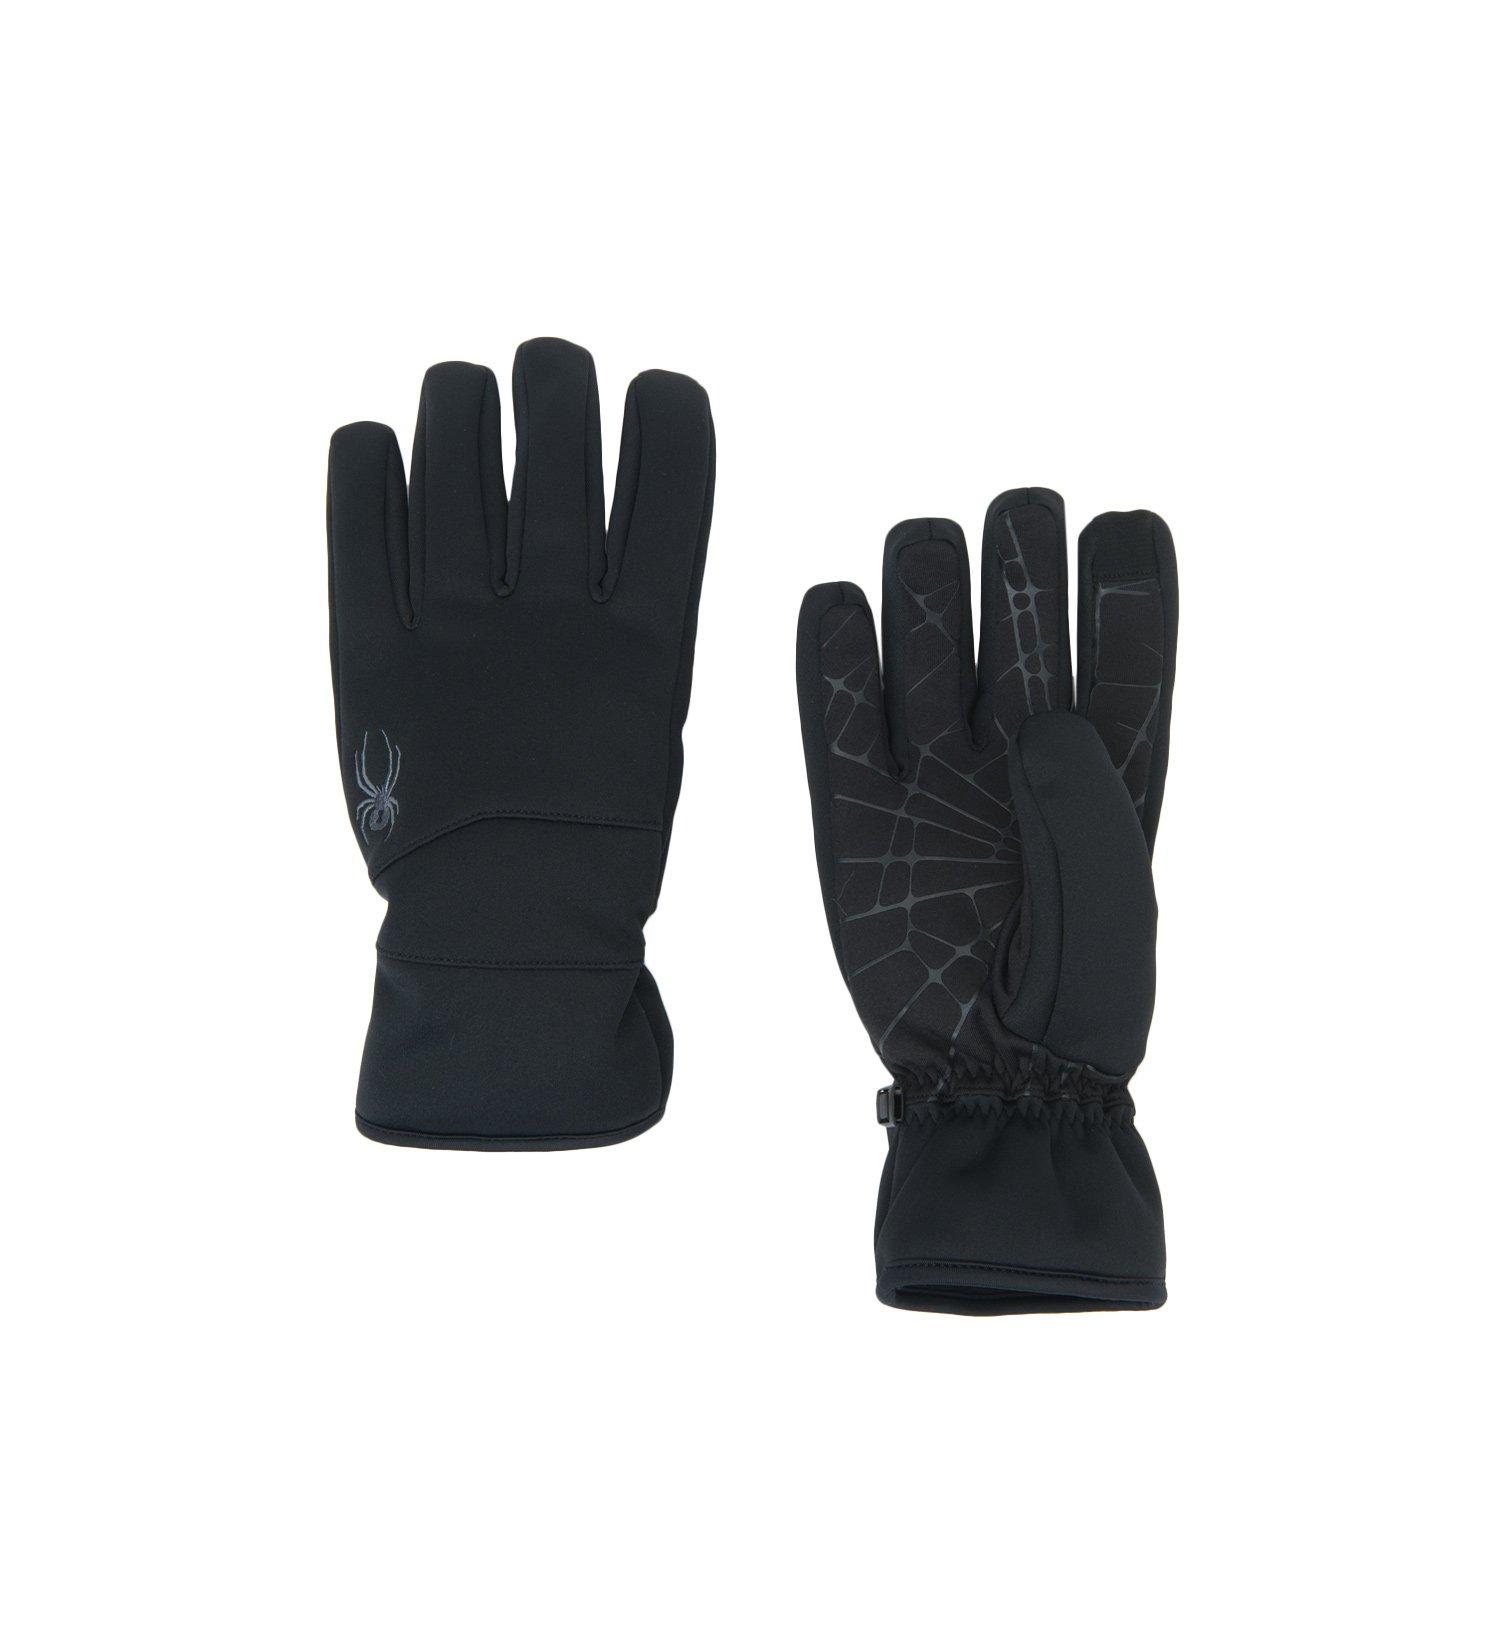 Spyder Facer Cpnduct Glove